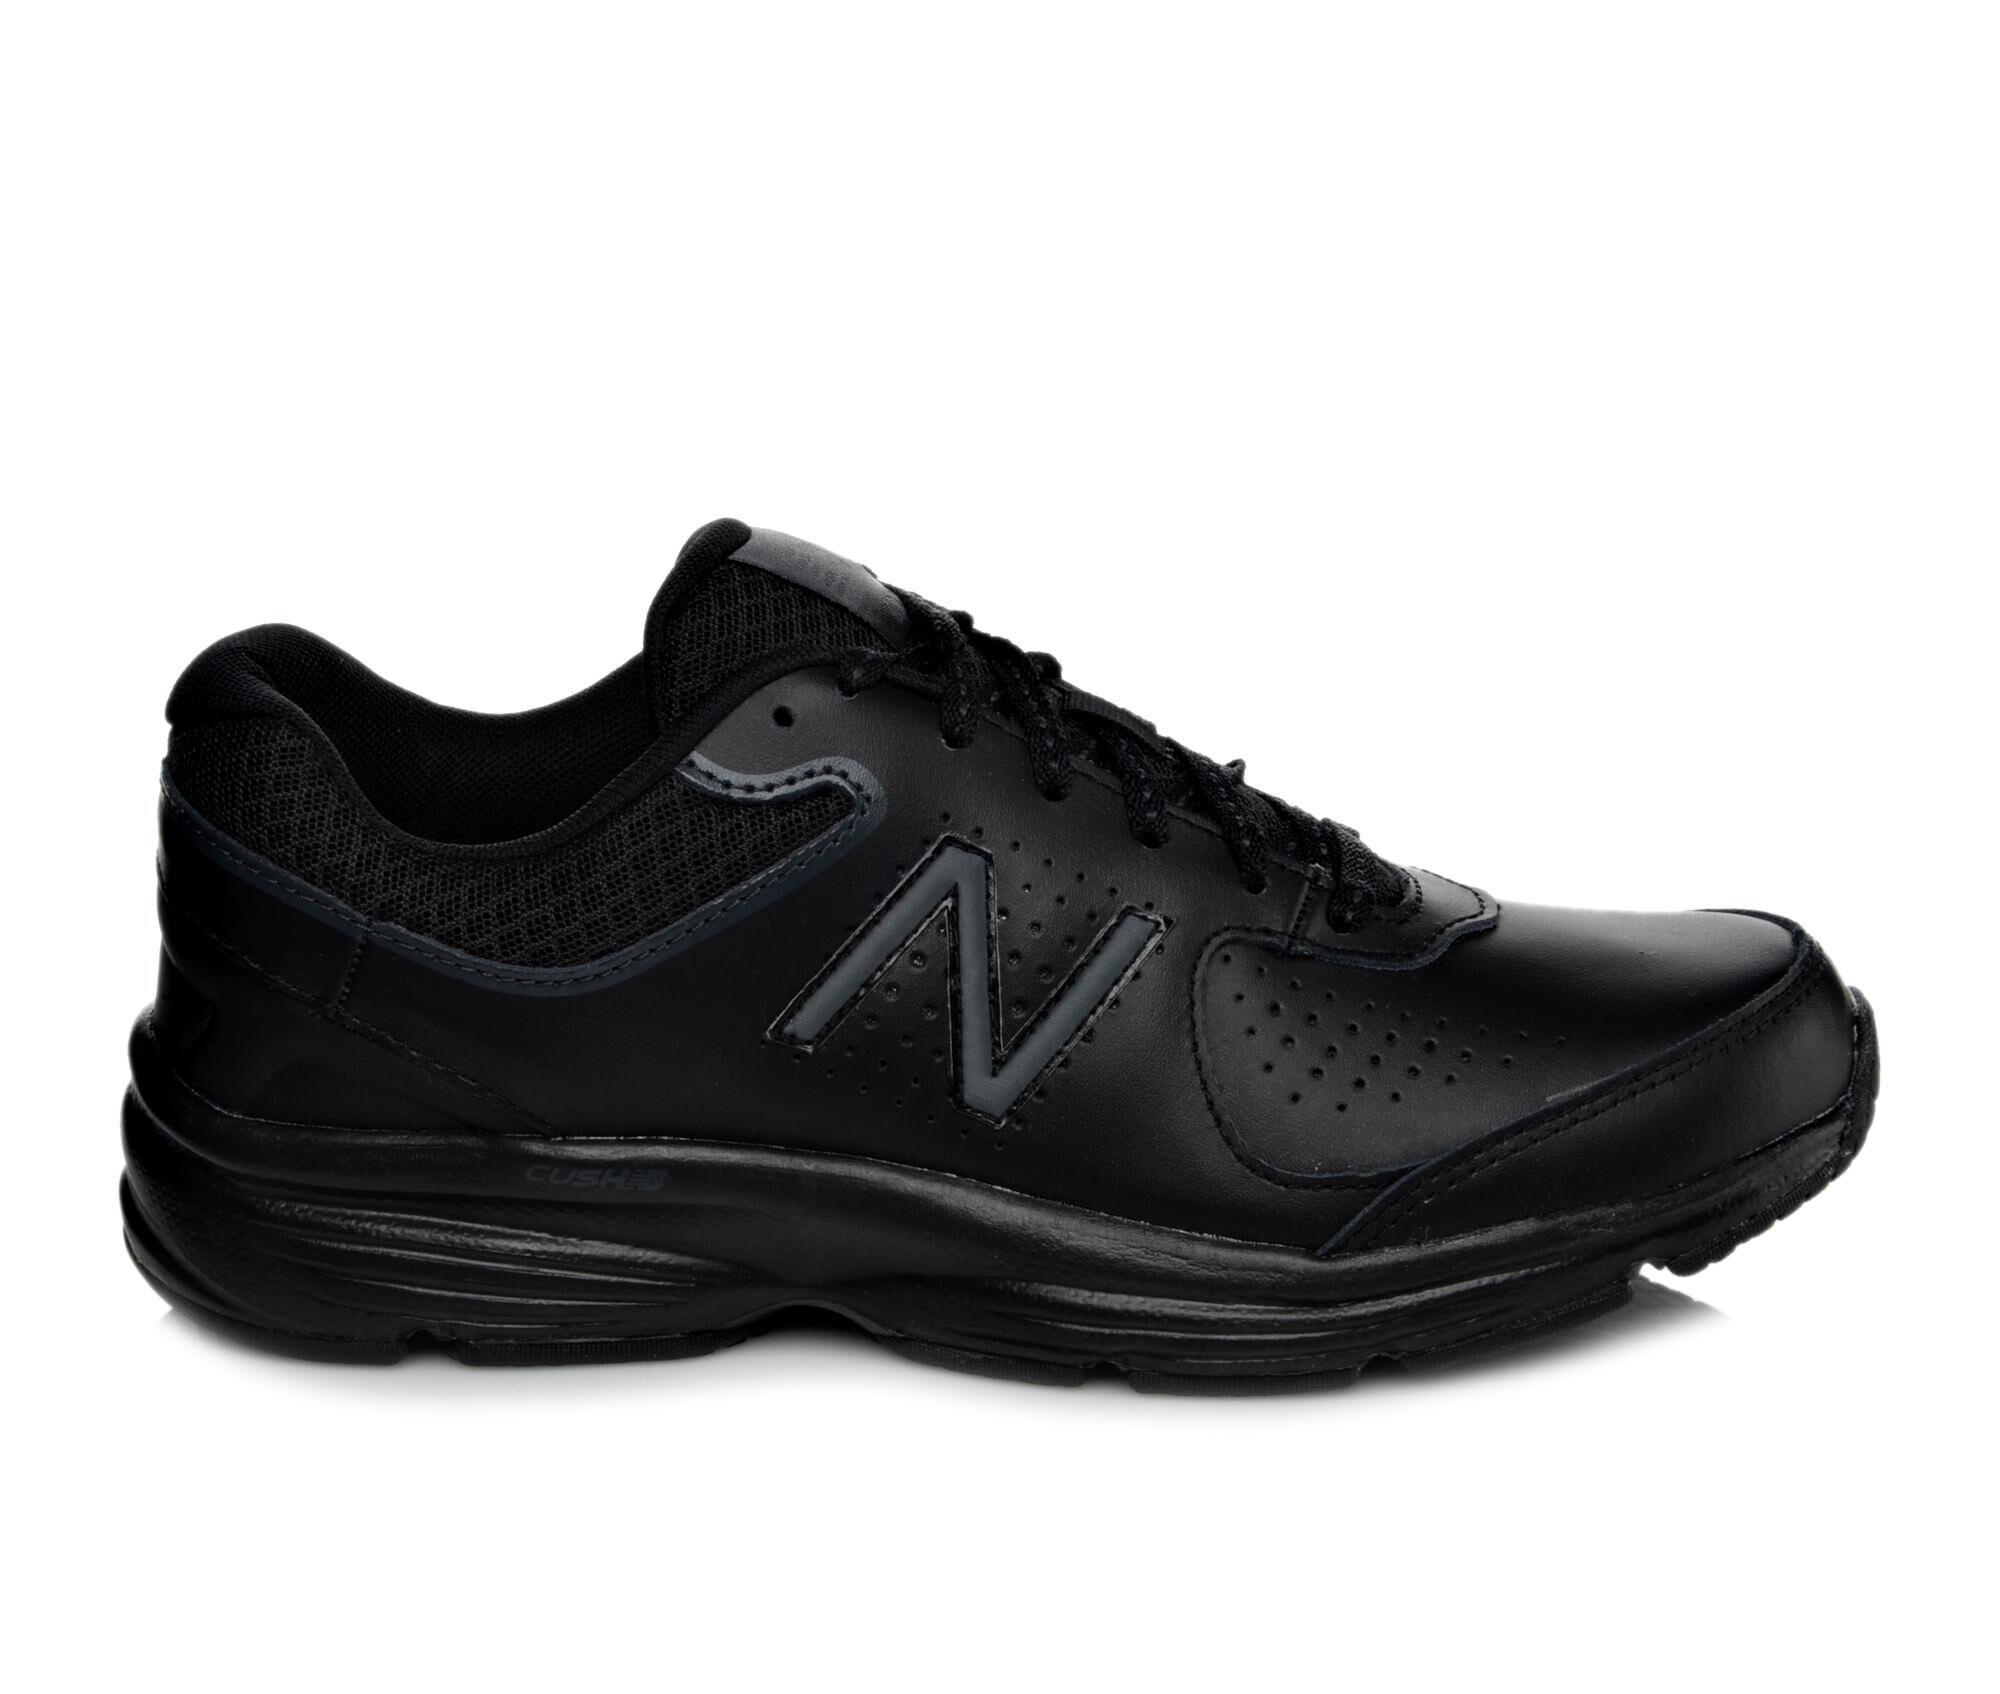 Women's New Balance WW411V2 Walking Shoes Black